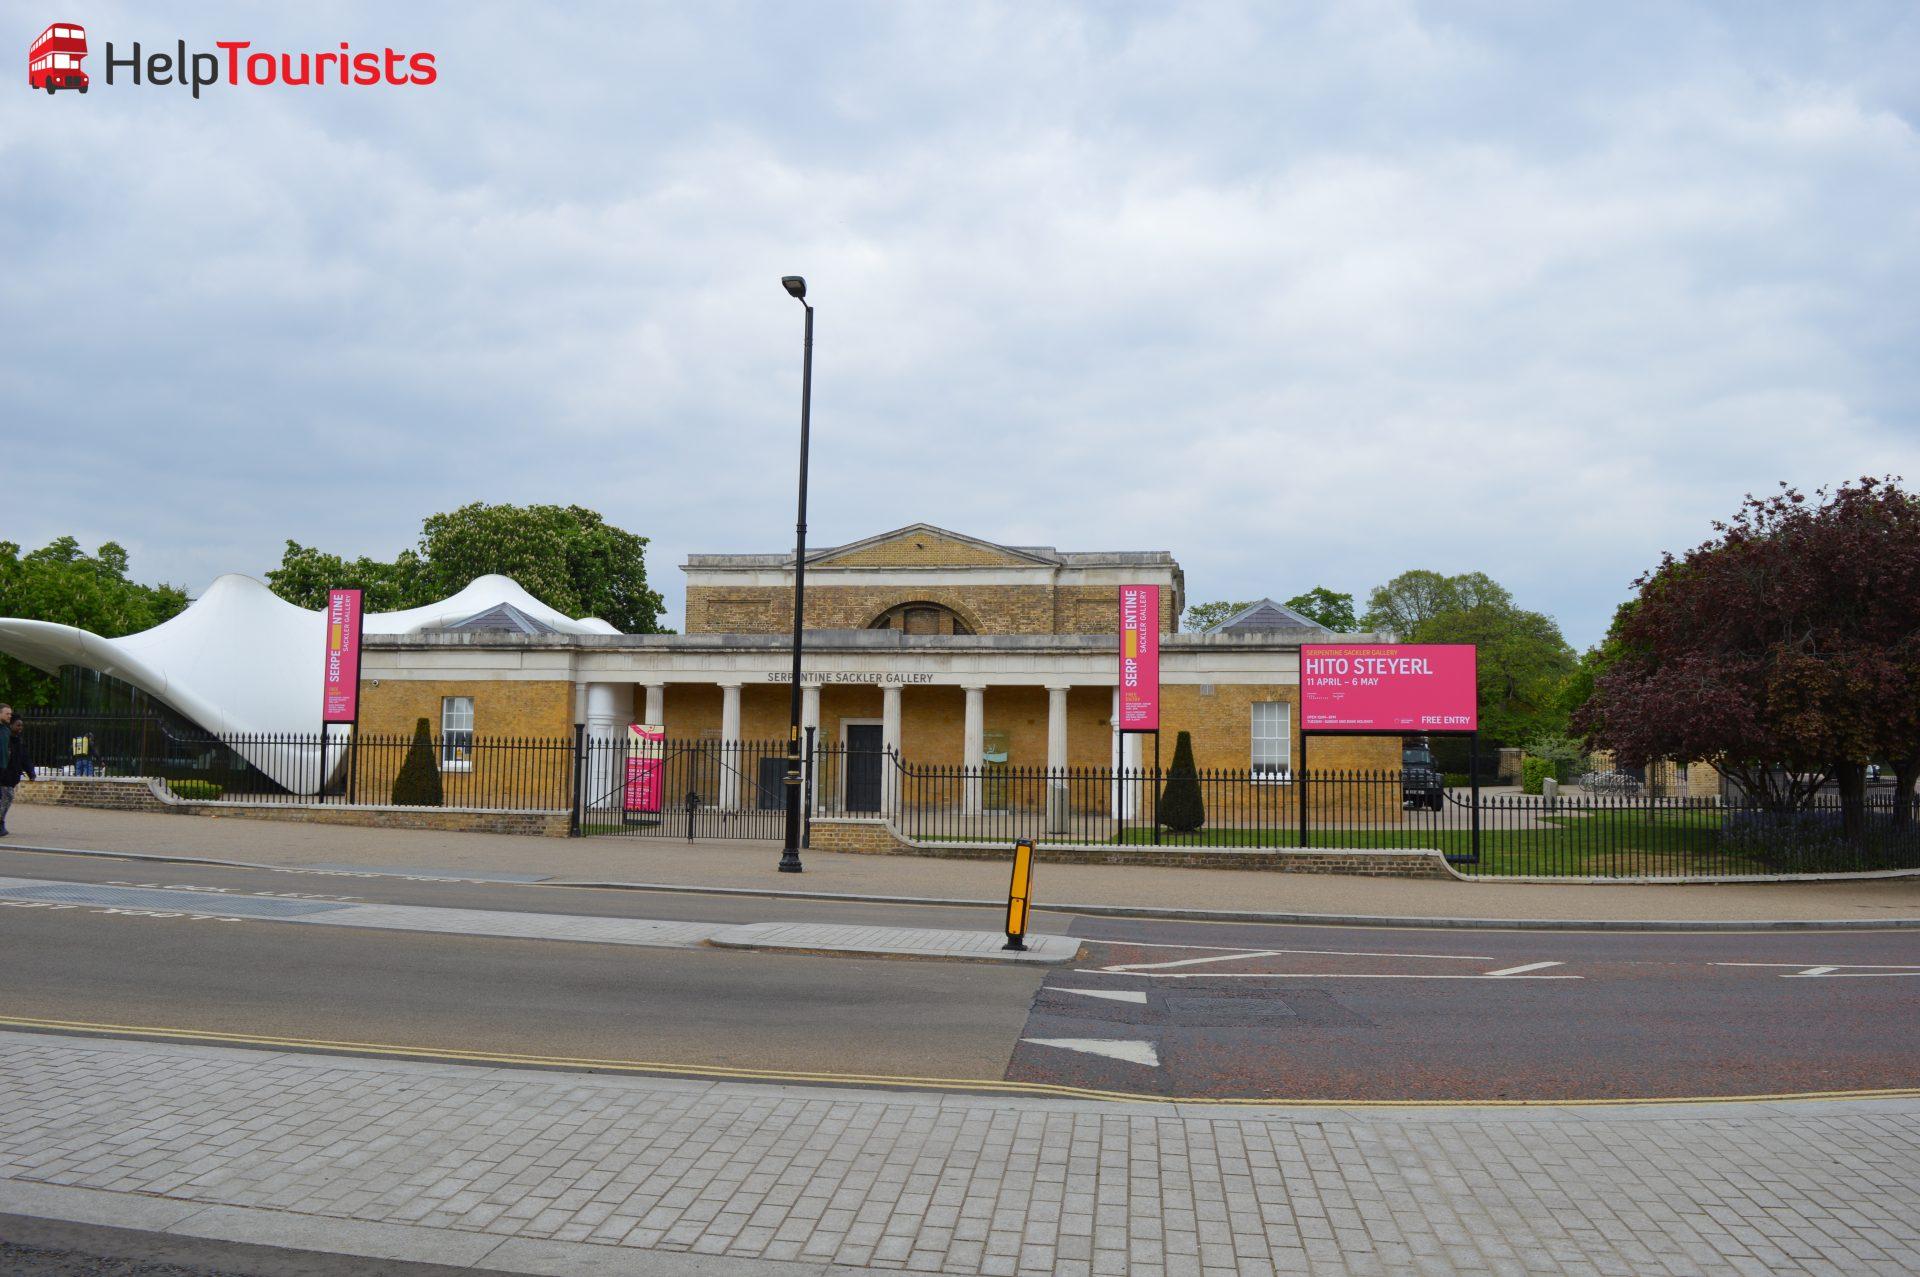 Serpentine Sackler Gallery London Hyde Park